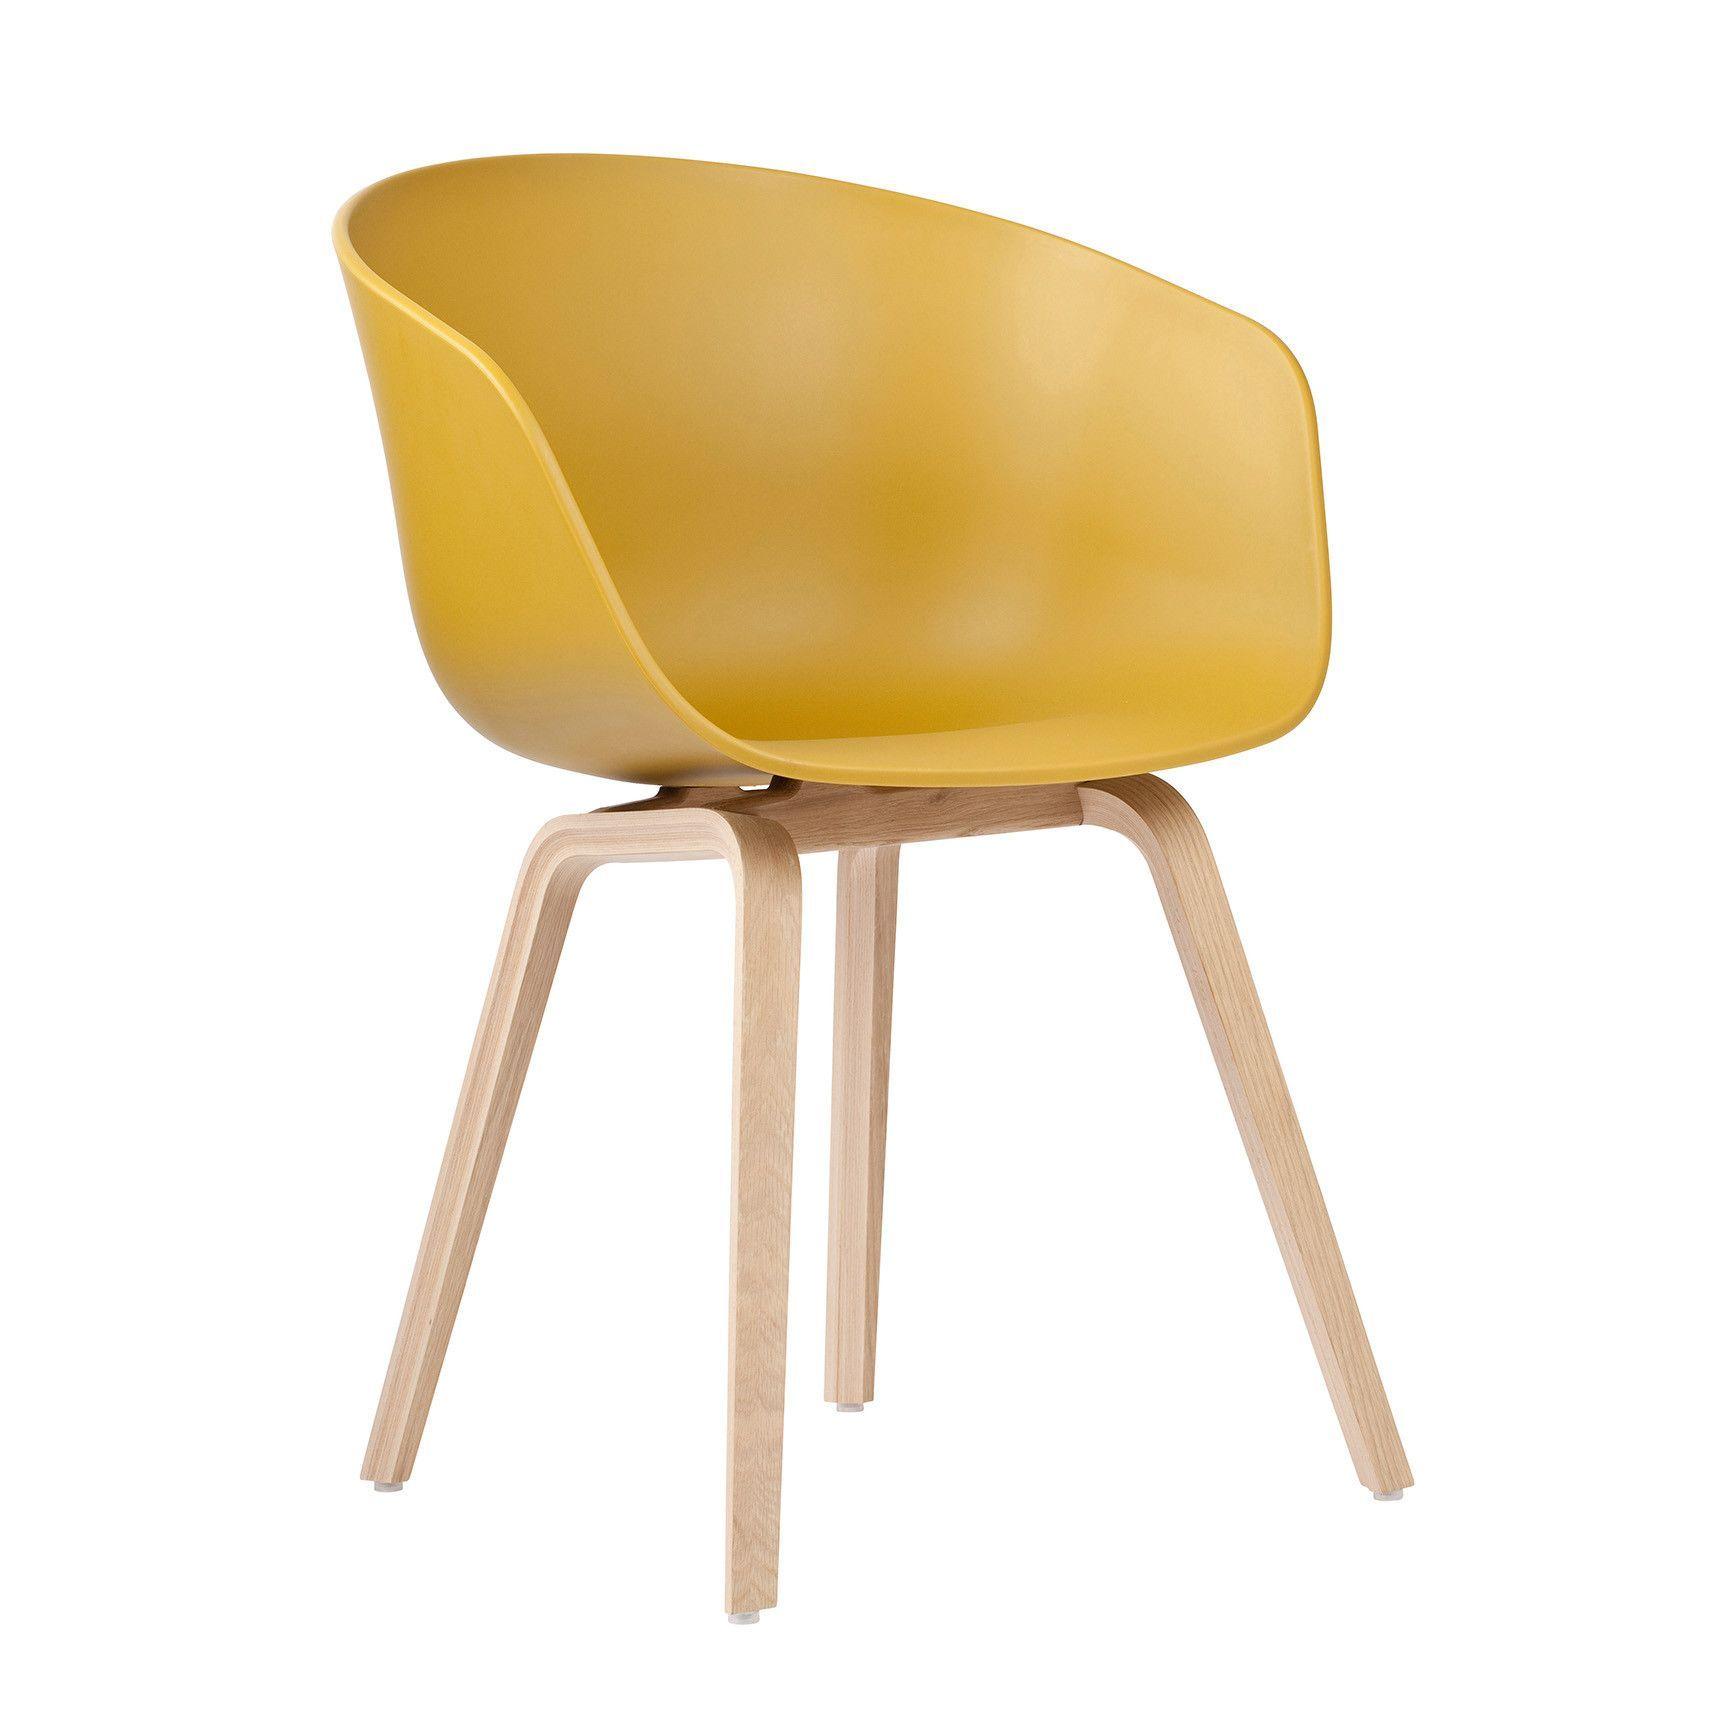 Hay About A Chair Aac22 Eetkamerstoelen Stoelen Mosterd